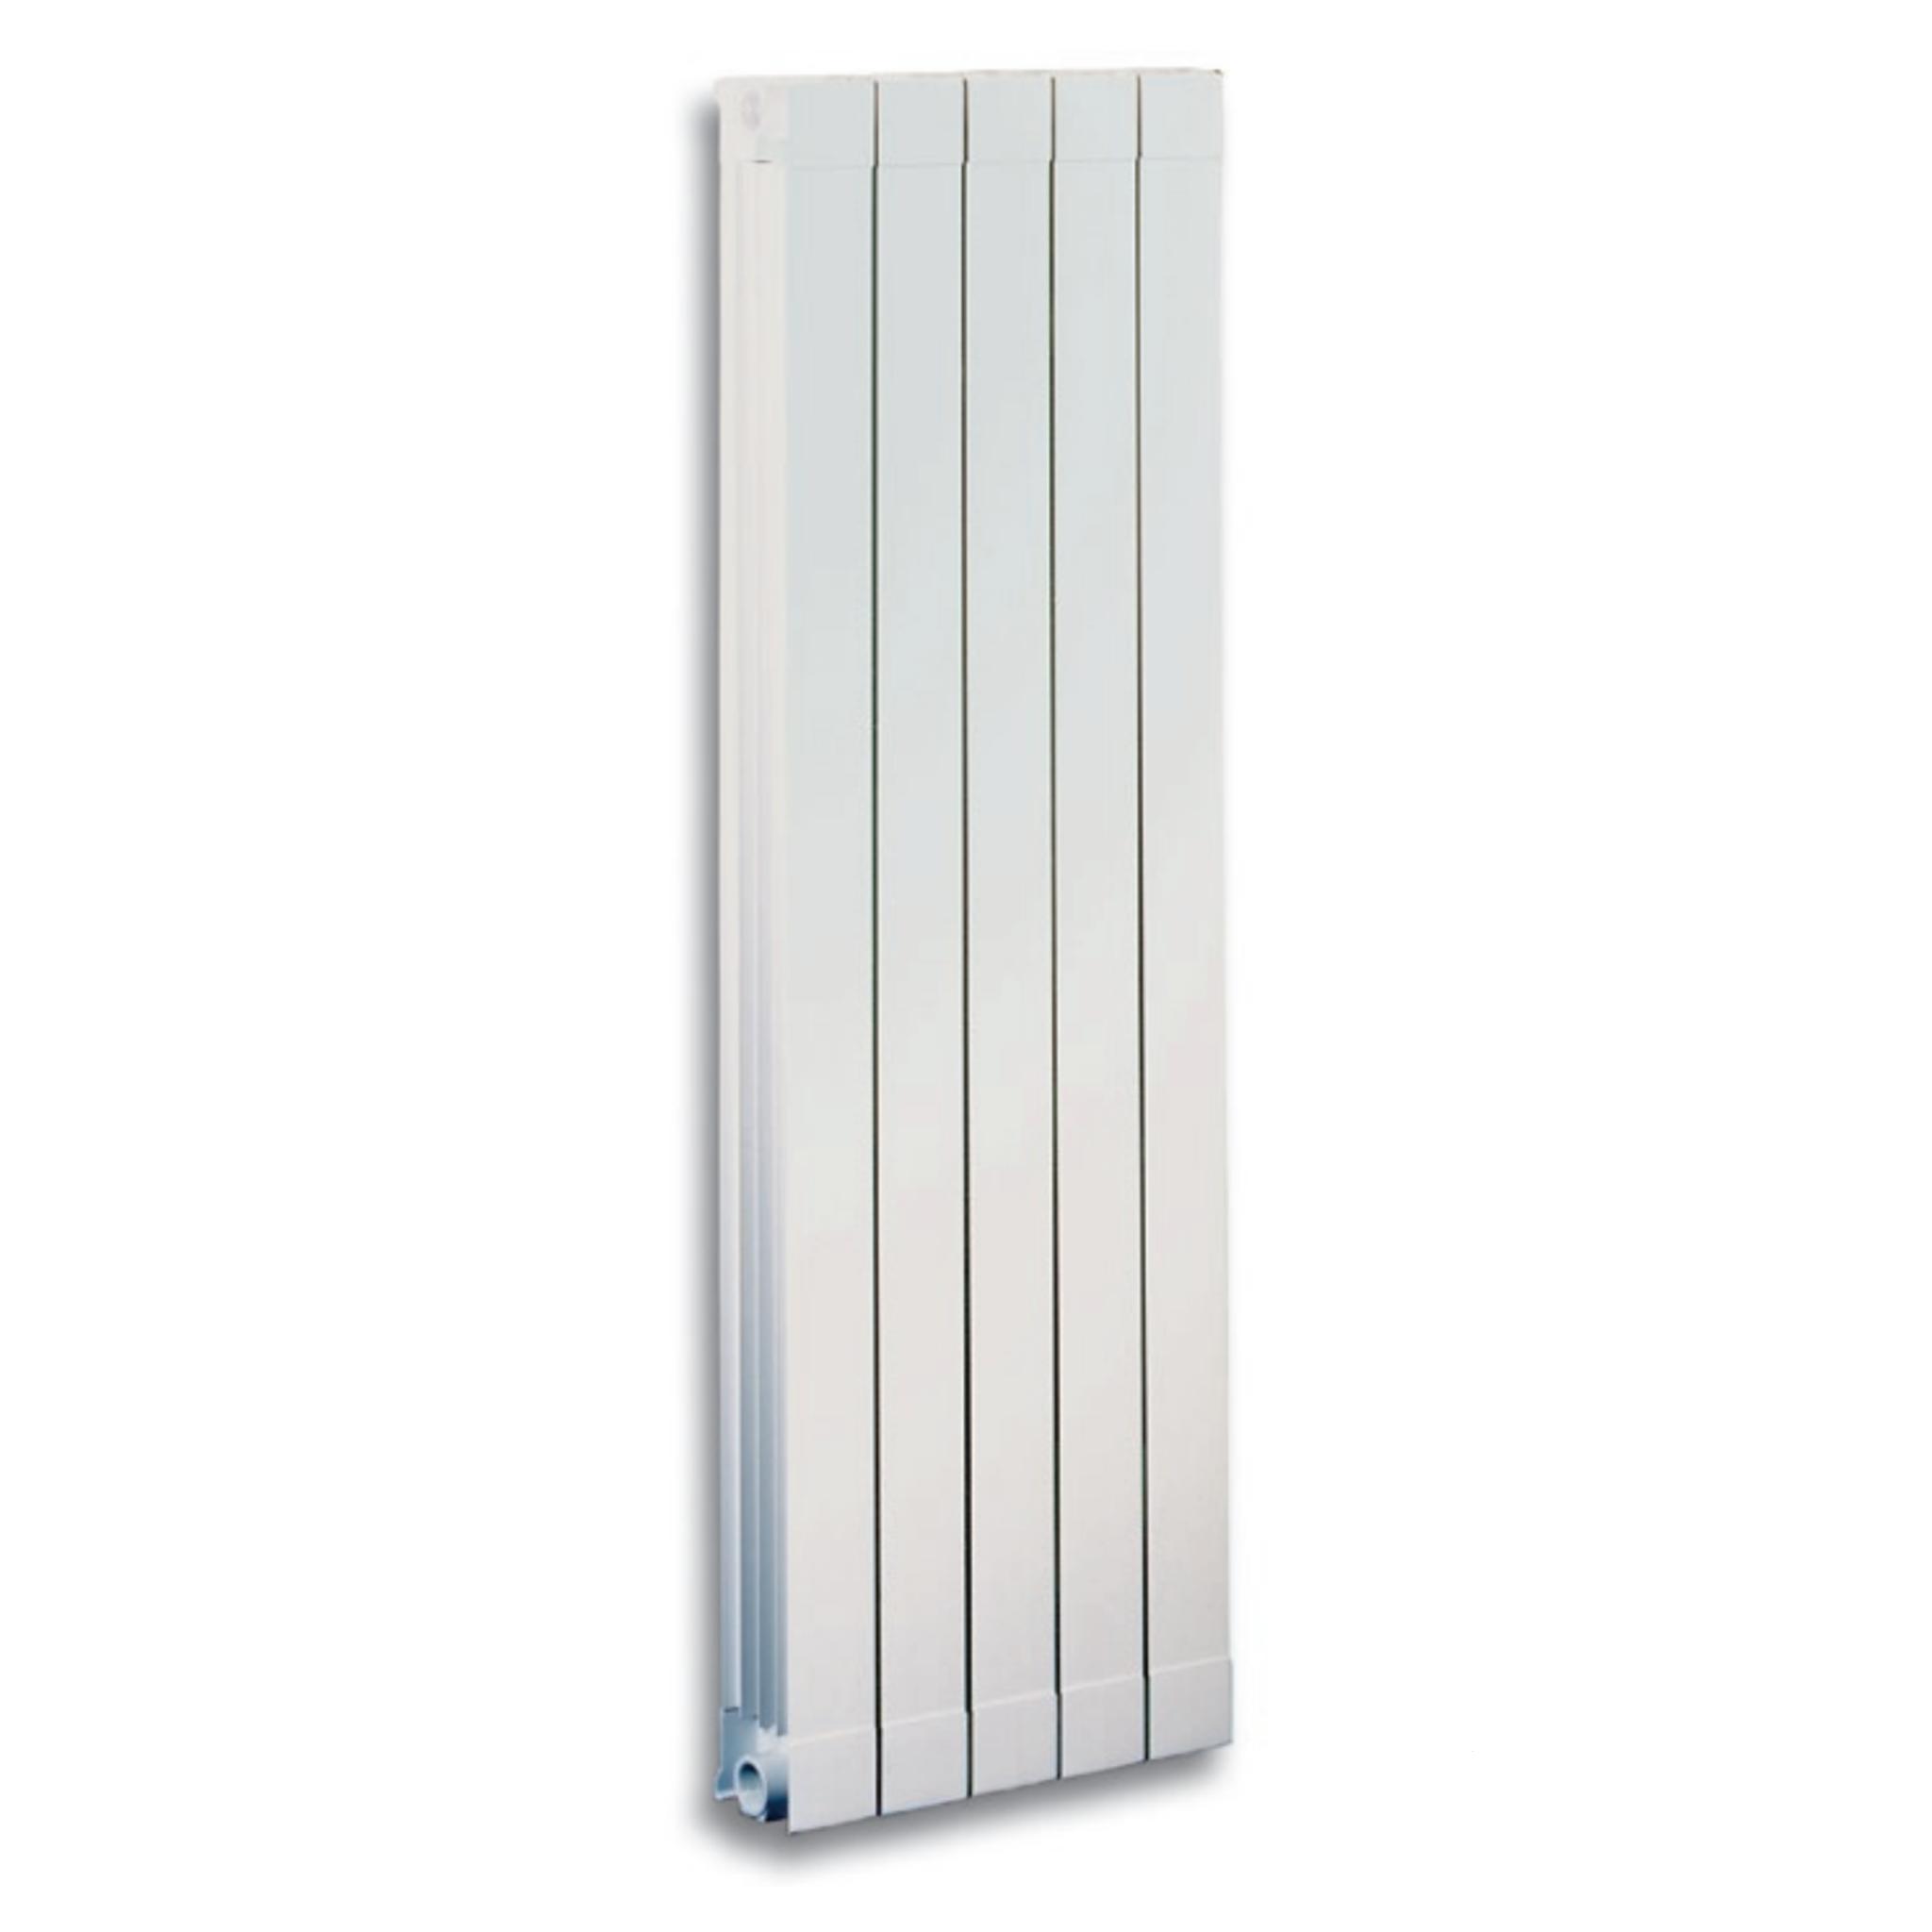 Global Termosifone radiatore alluminio bianco da 3 a 6 elementi OSCAR 900 - 4 elementi